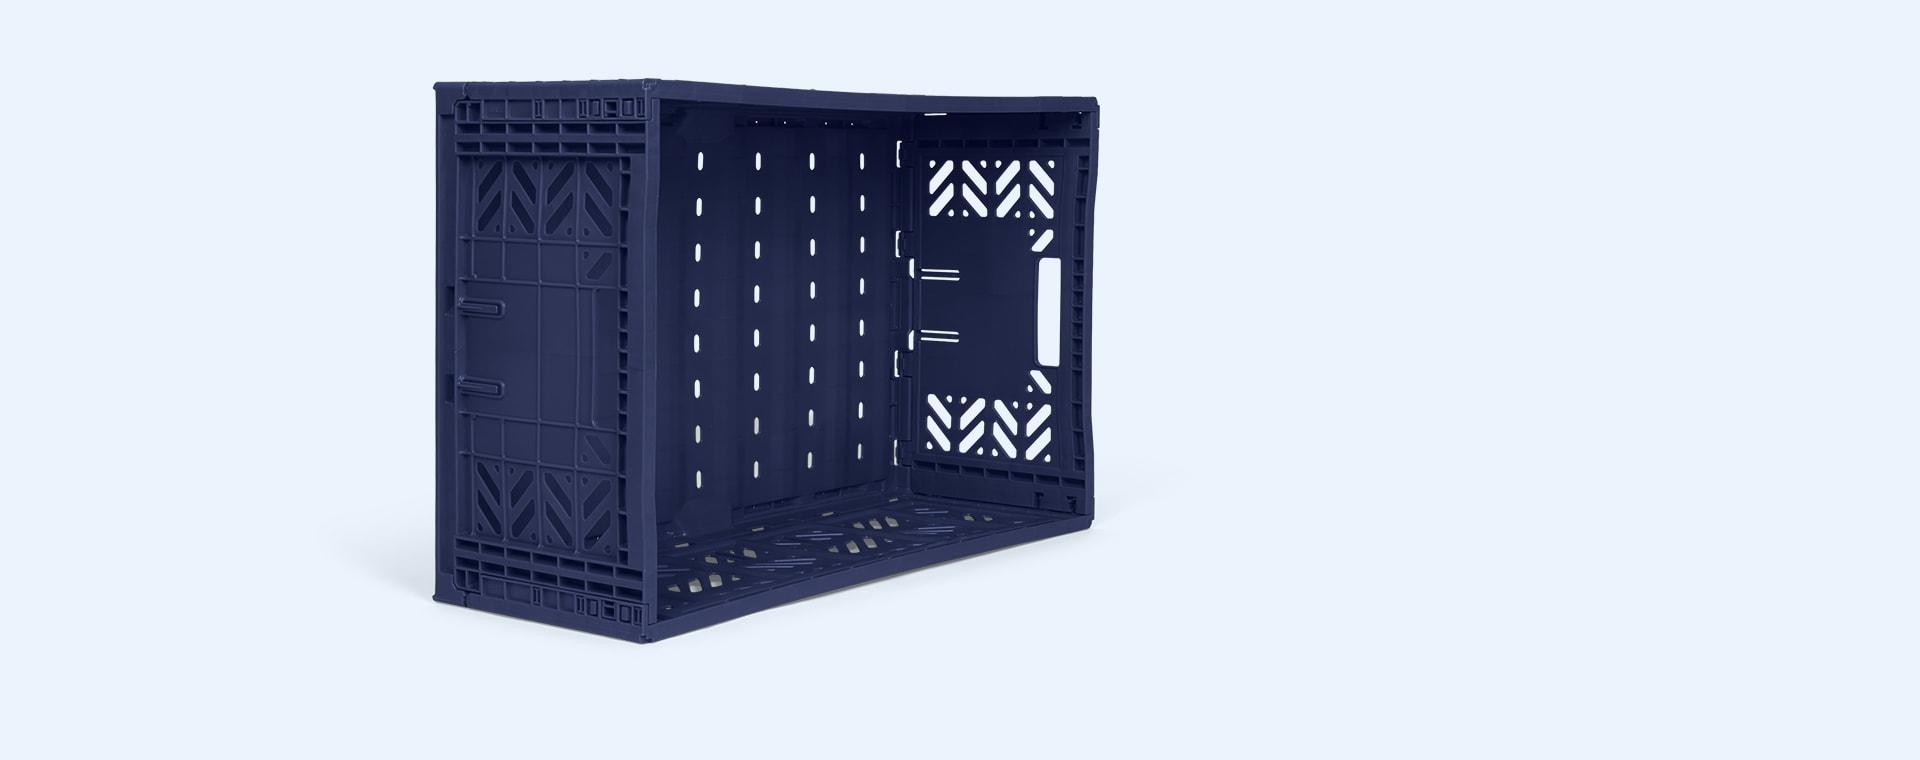 Navy Aykasa Maxi Crate